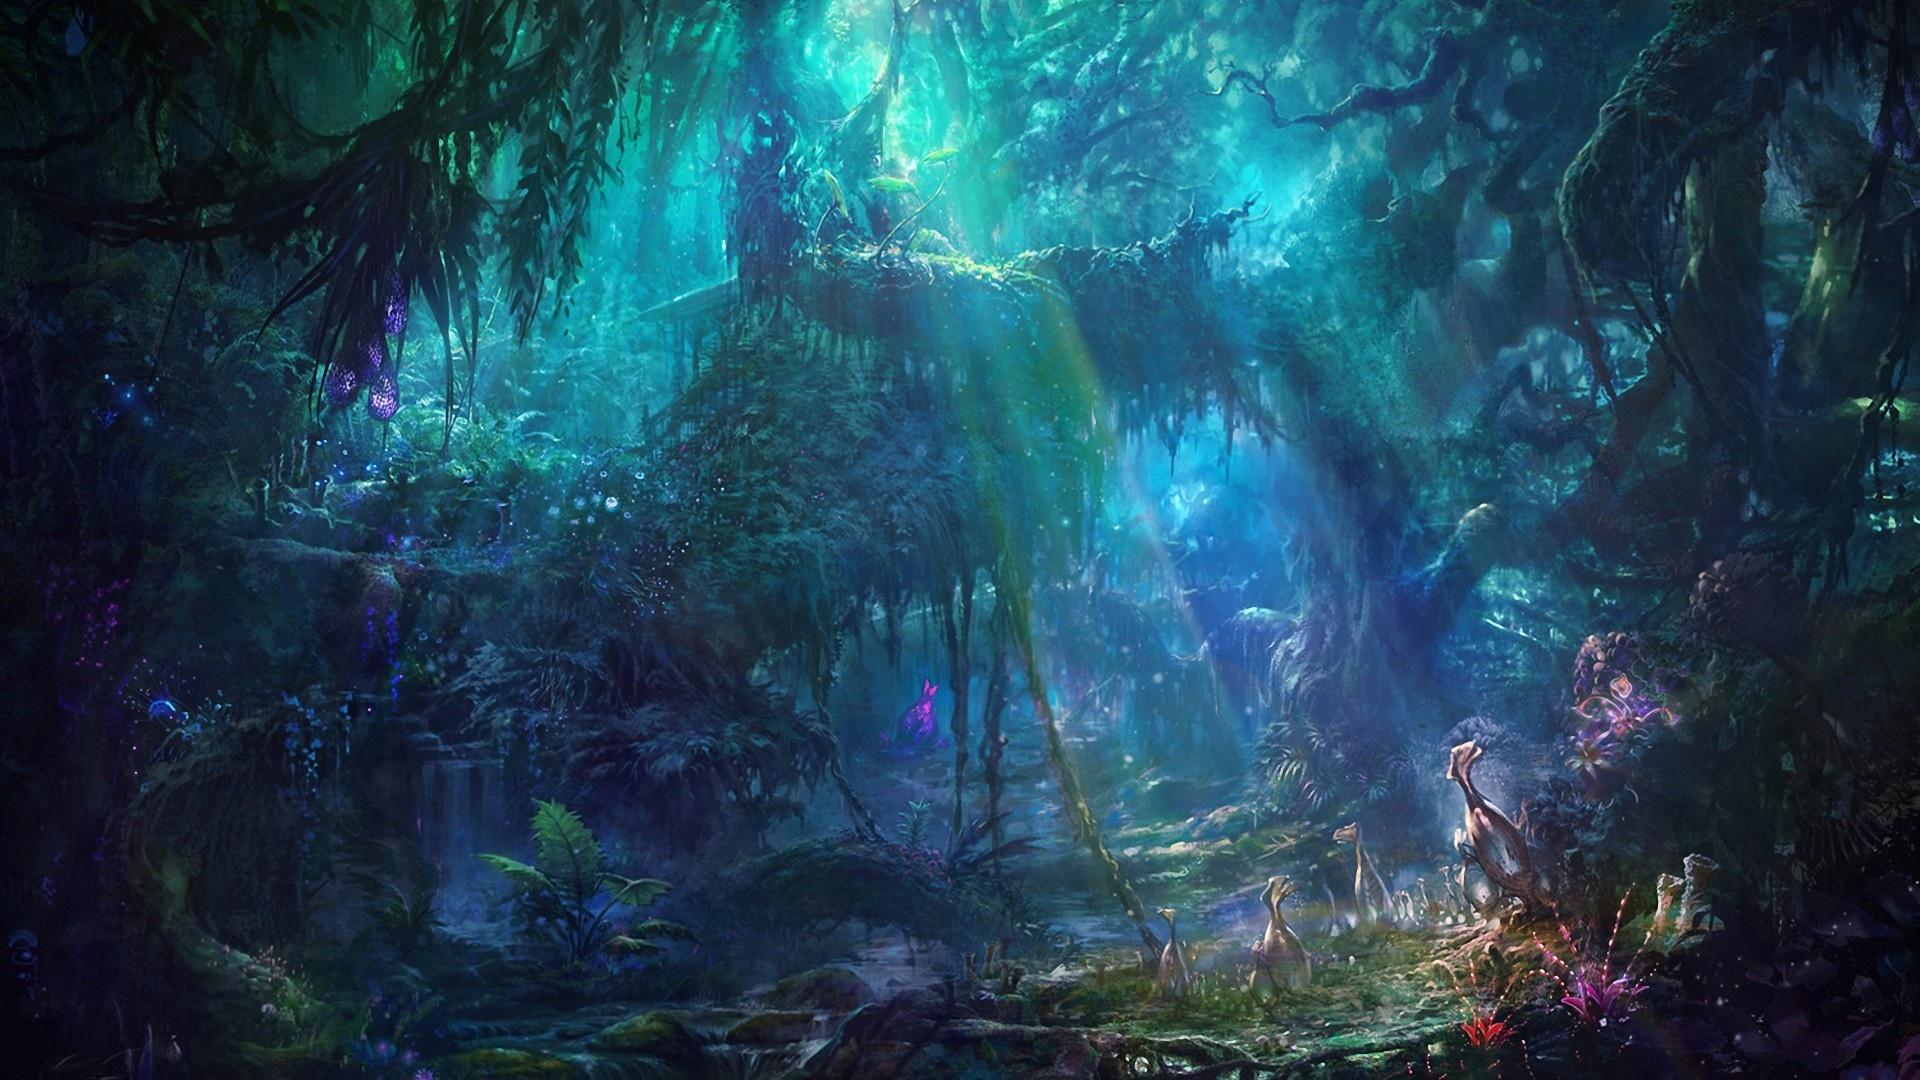 Fantasy Landsсape hd wallpaper 1080